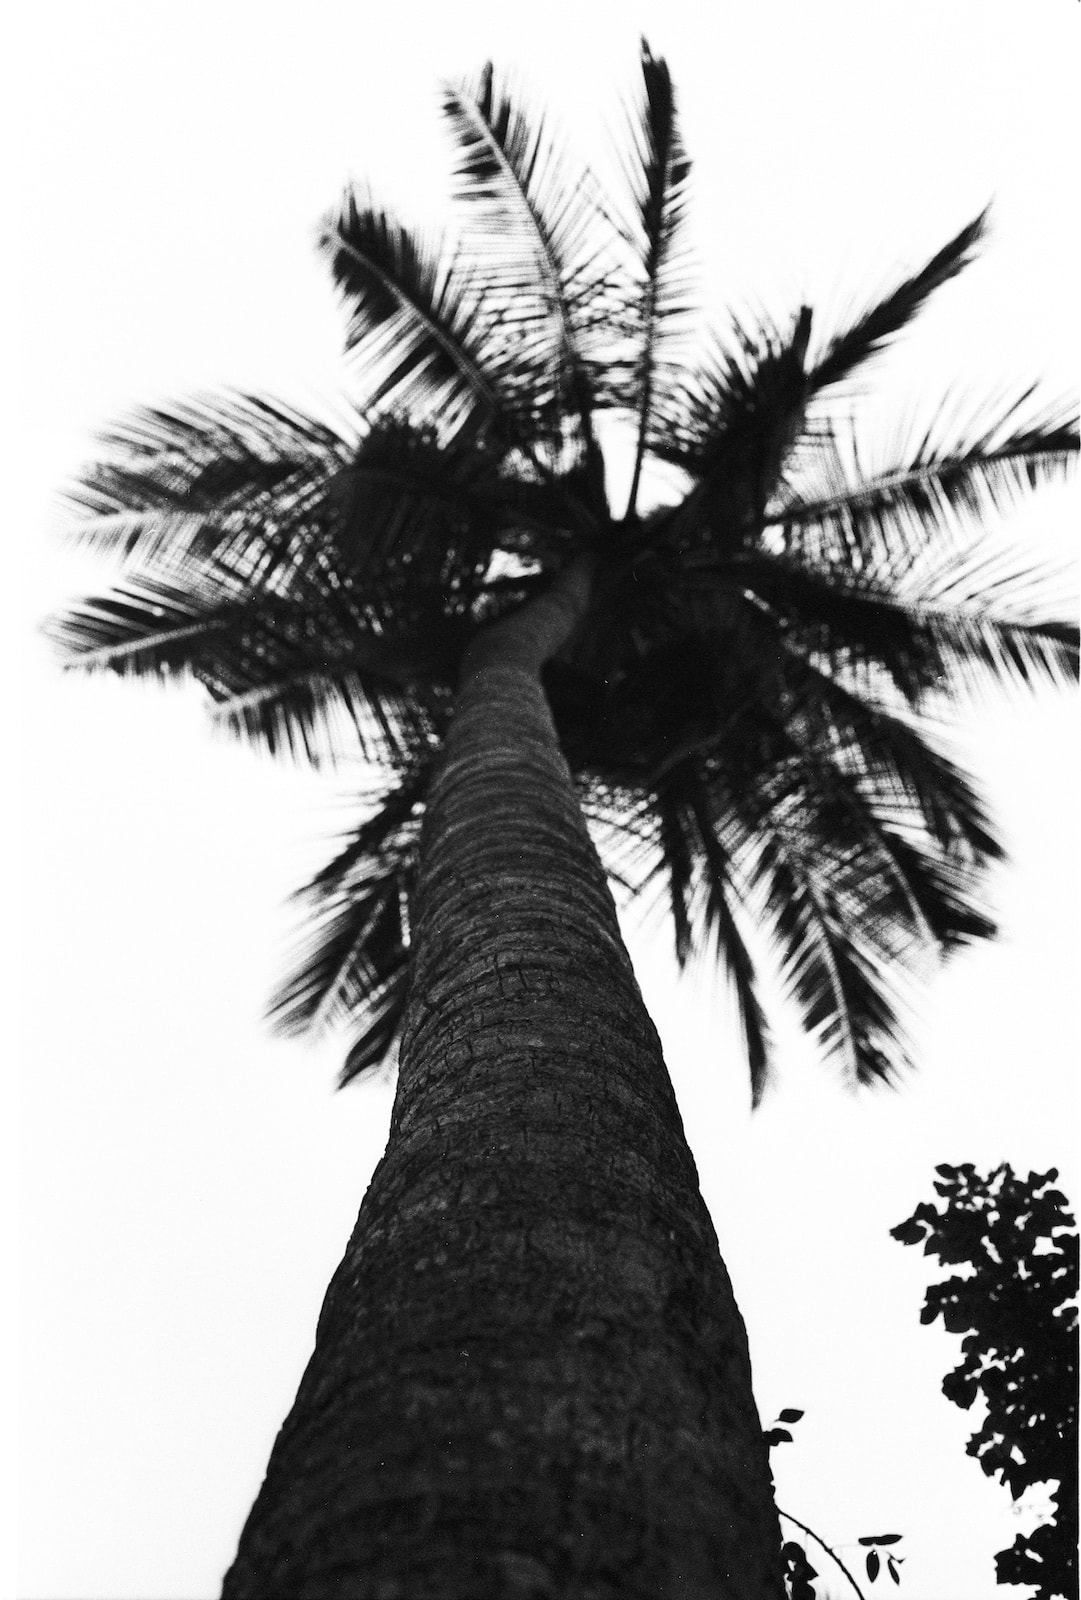 Palme in schwarz weiß, analog